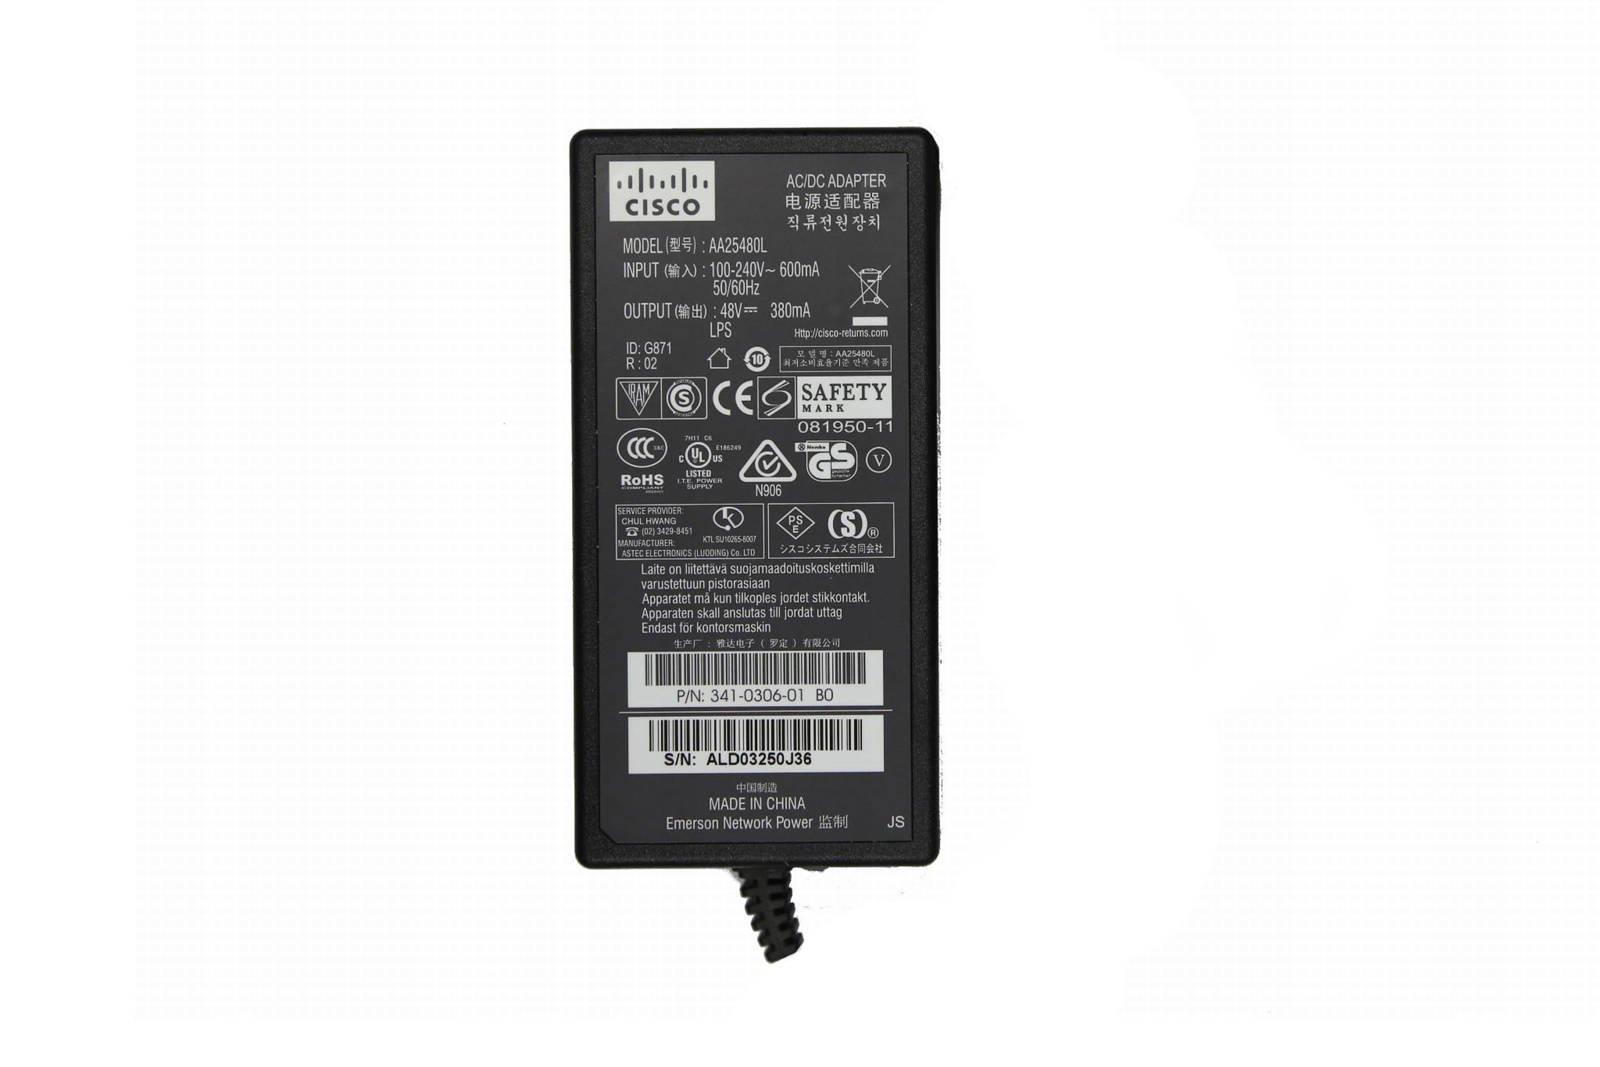 Charger Cisco 48V 0.38V 182W AA25480L 5.5/2.5mm